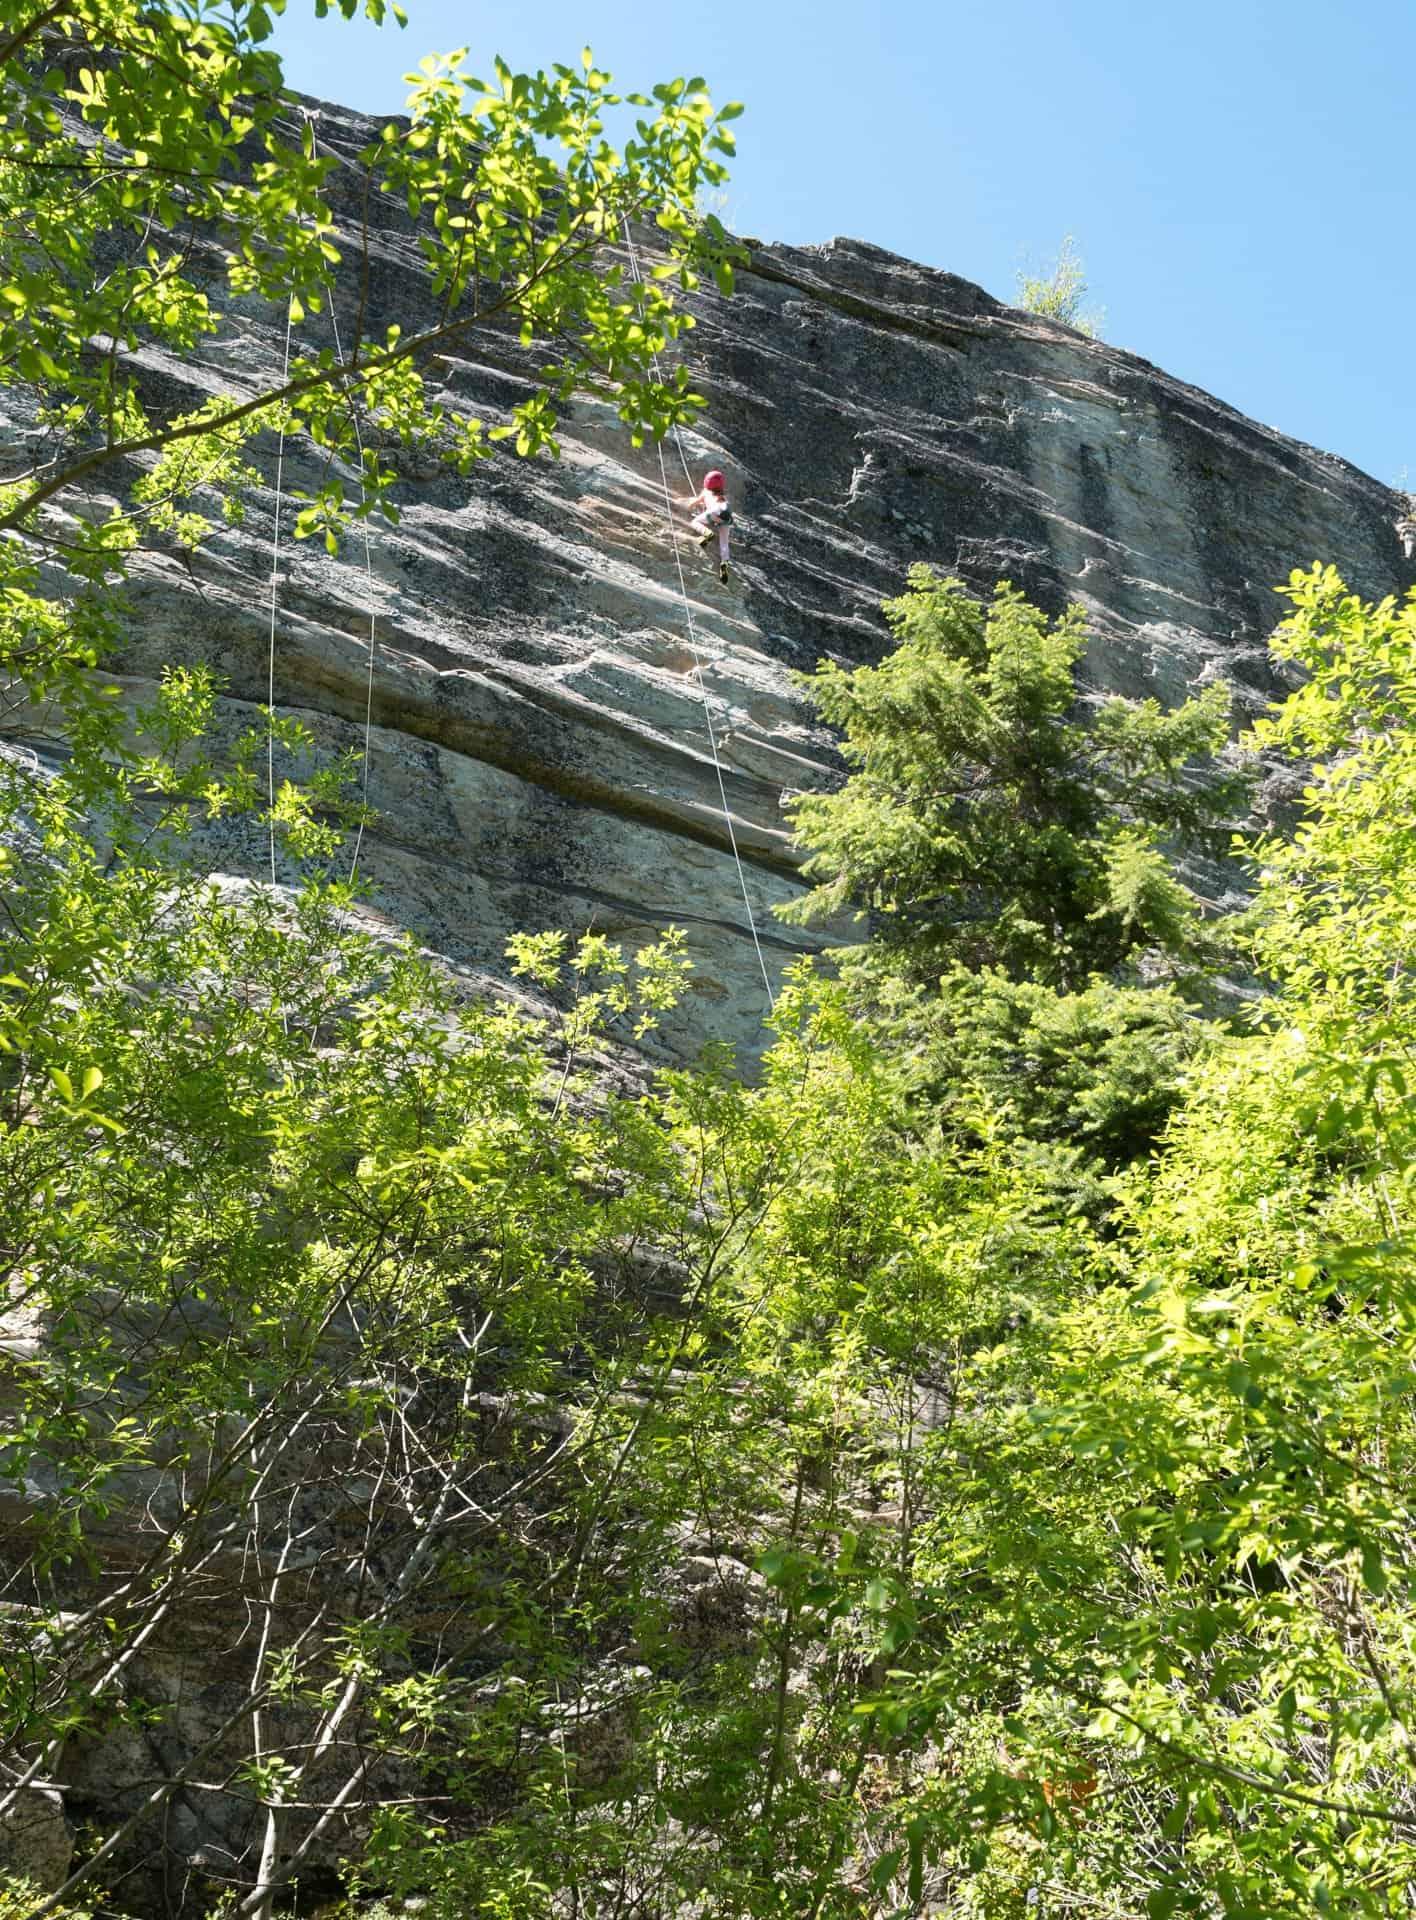 Rock Climbing With Kids At Skaha Bluffs Provincial Park